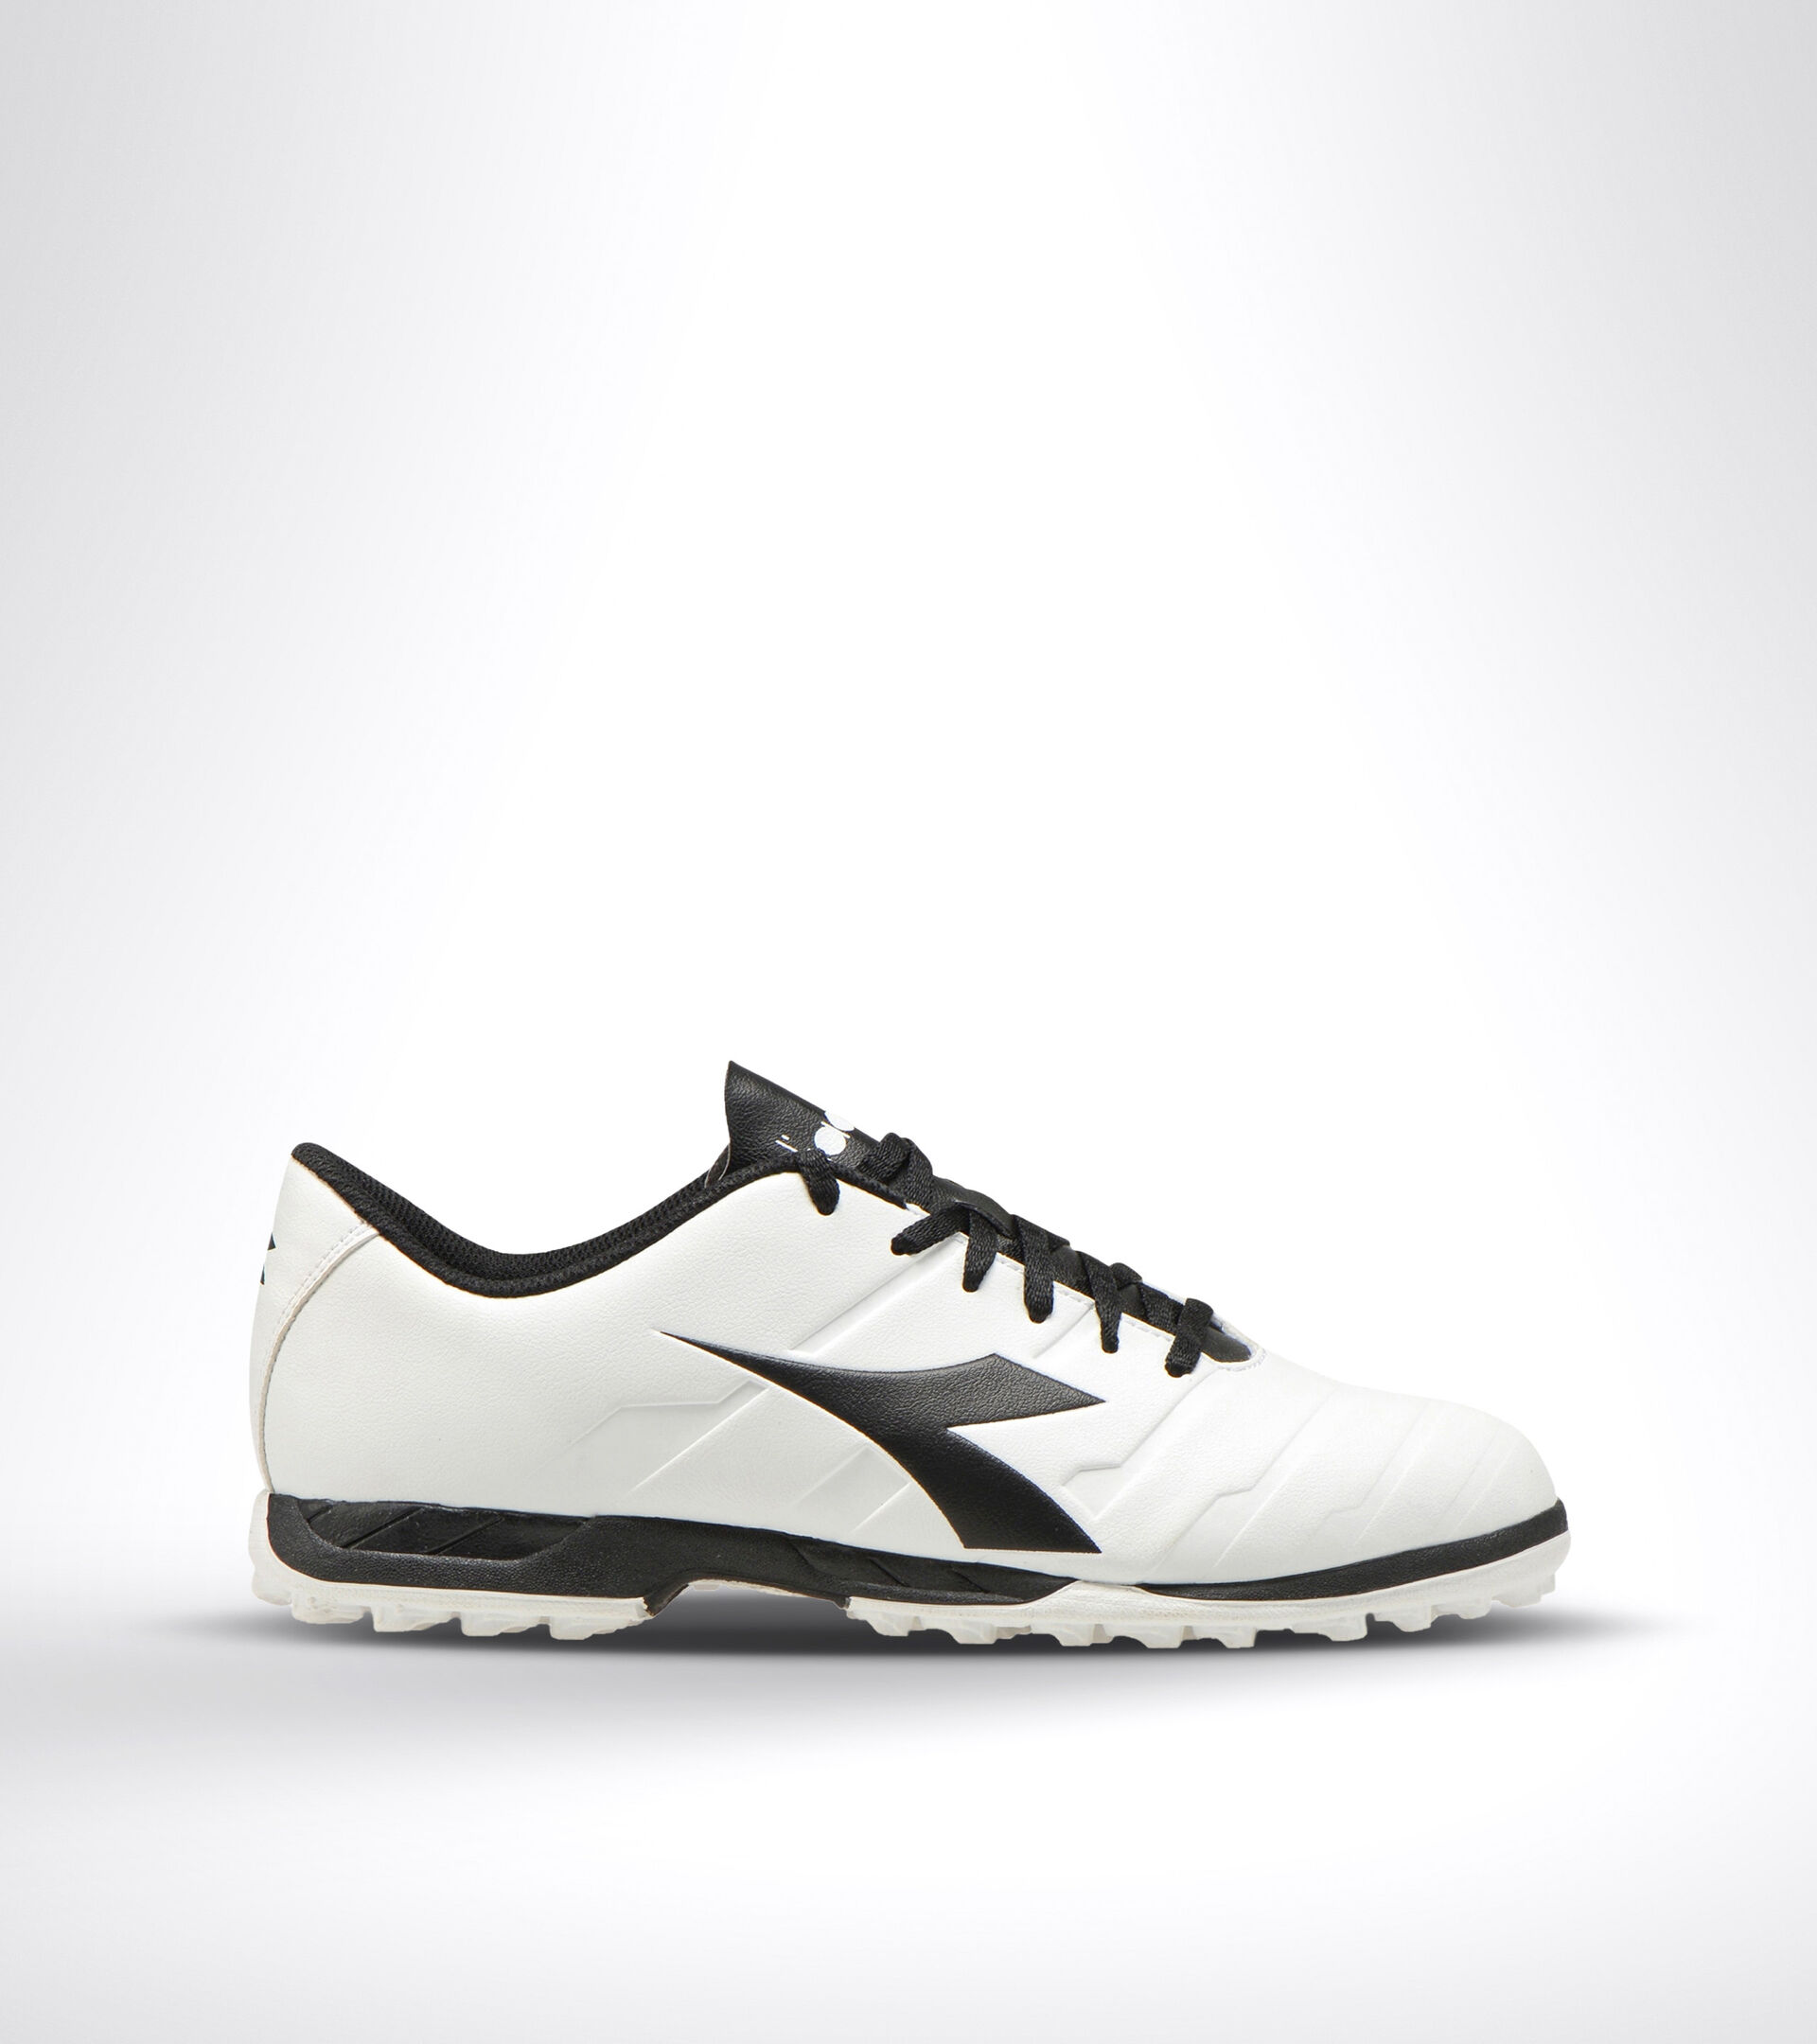 Footwear Sport UOMO PICHICHI 3 TF WHITE/BLACK Diadora